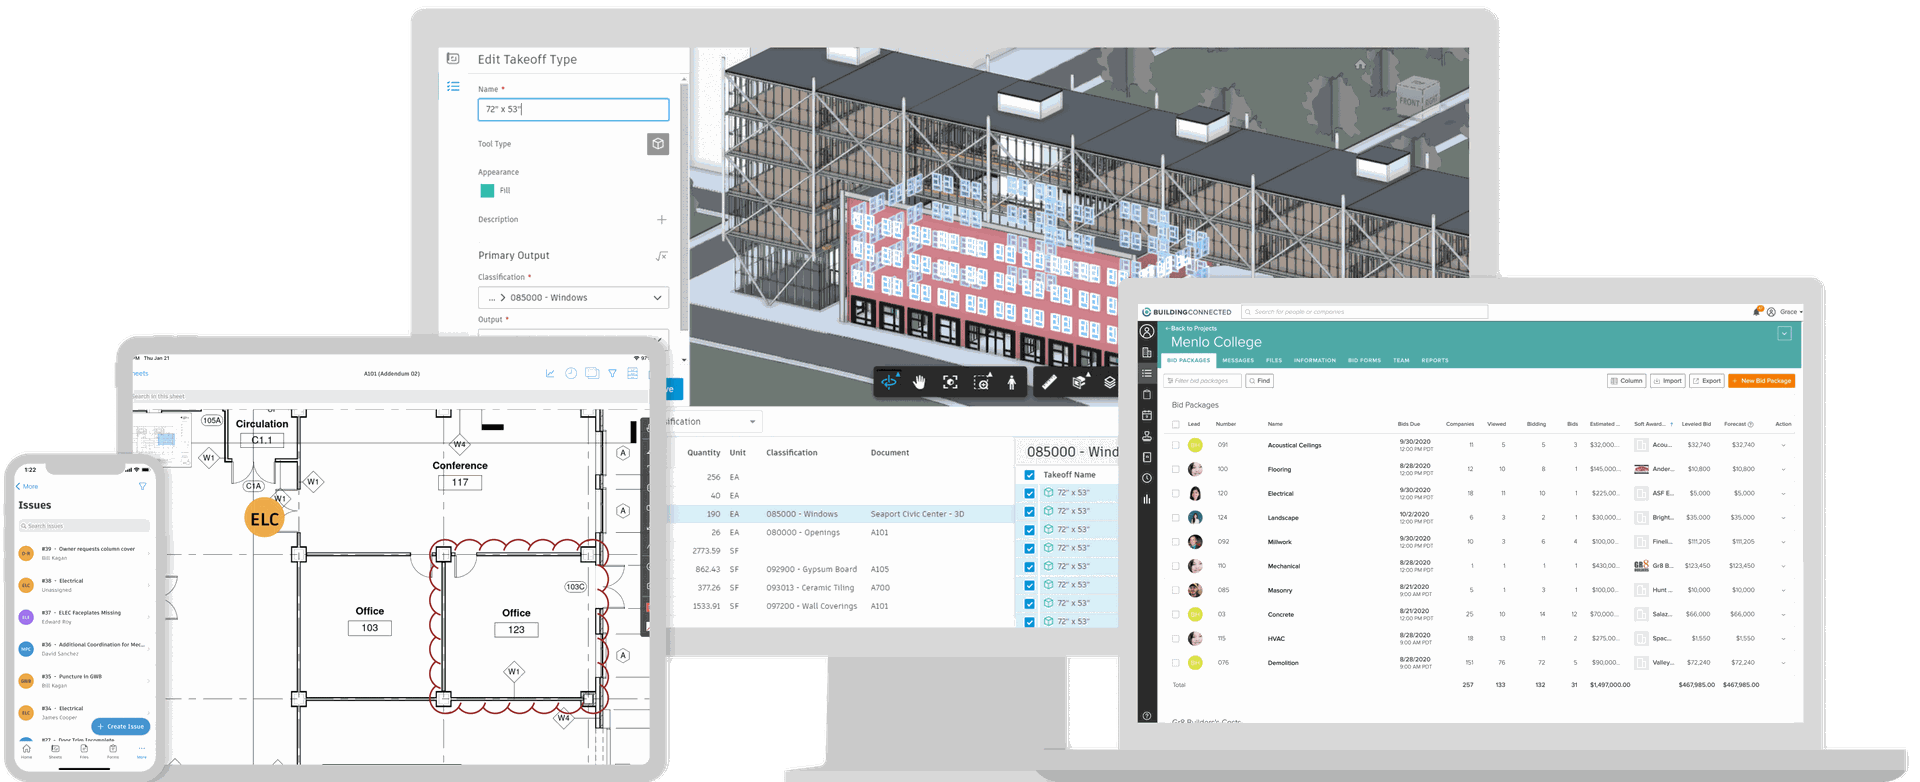 Autodesk Construction Cloud Differentiators- All Devices